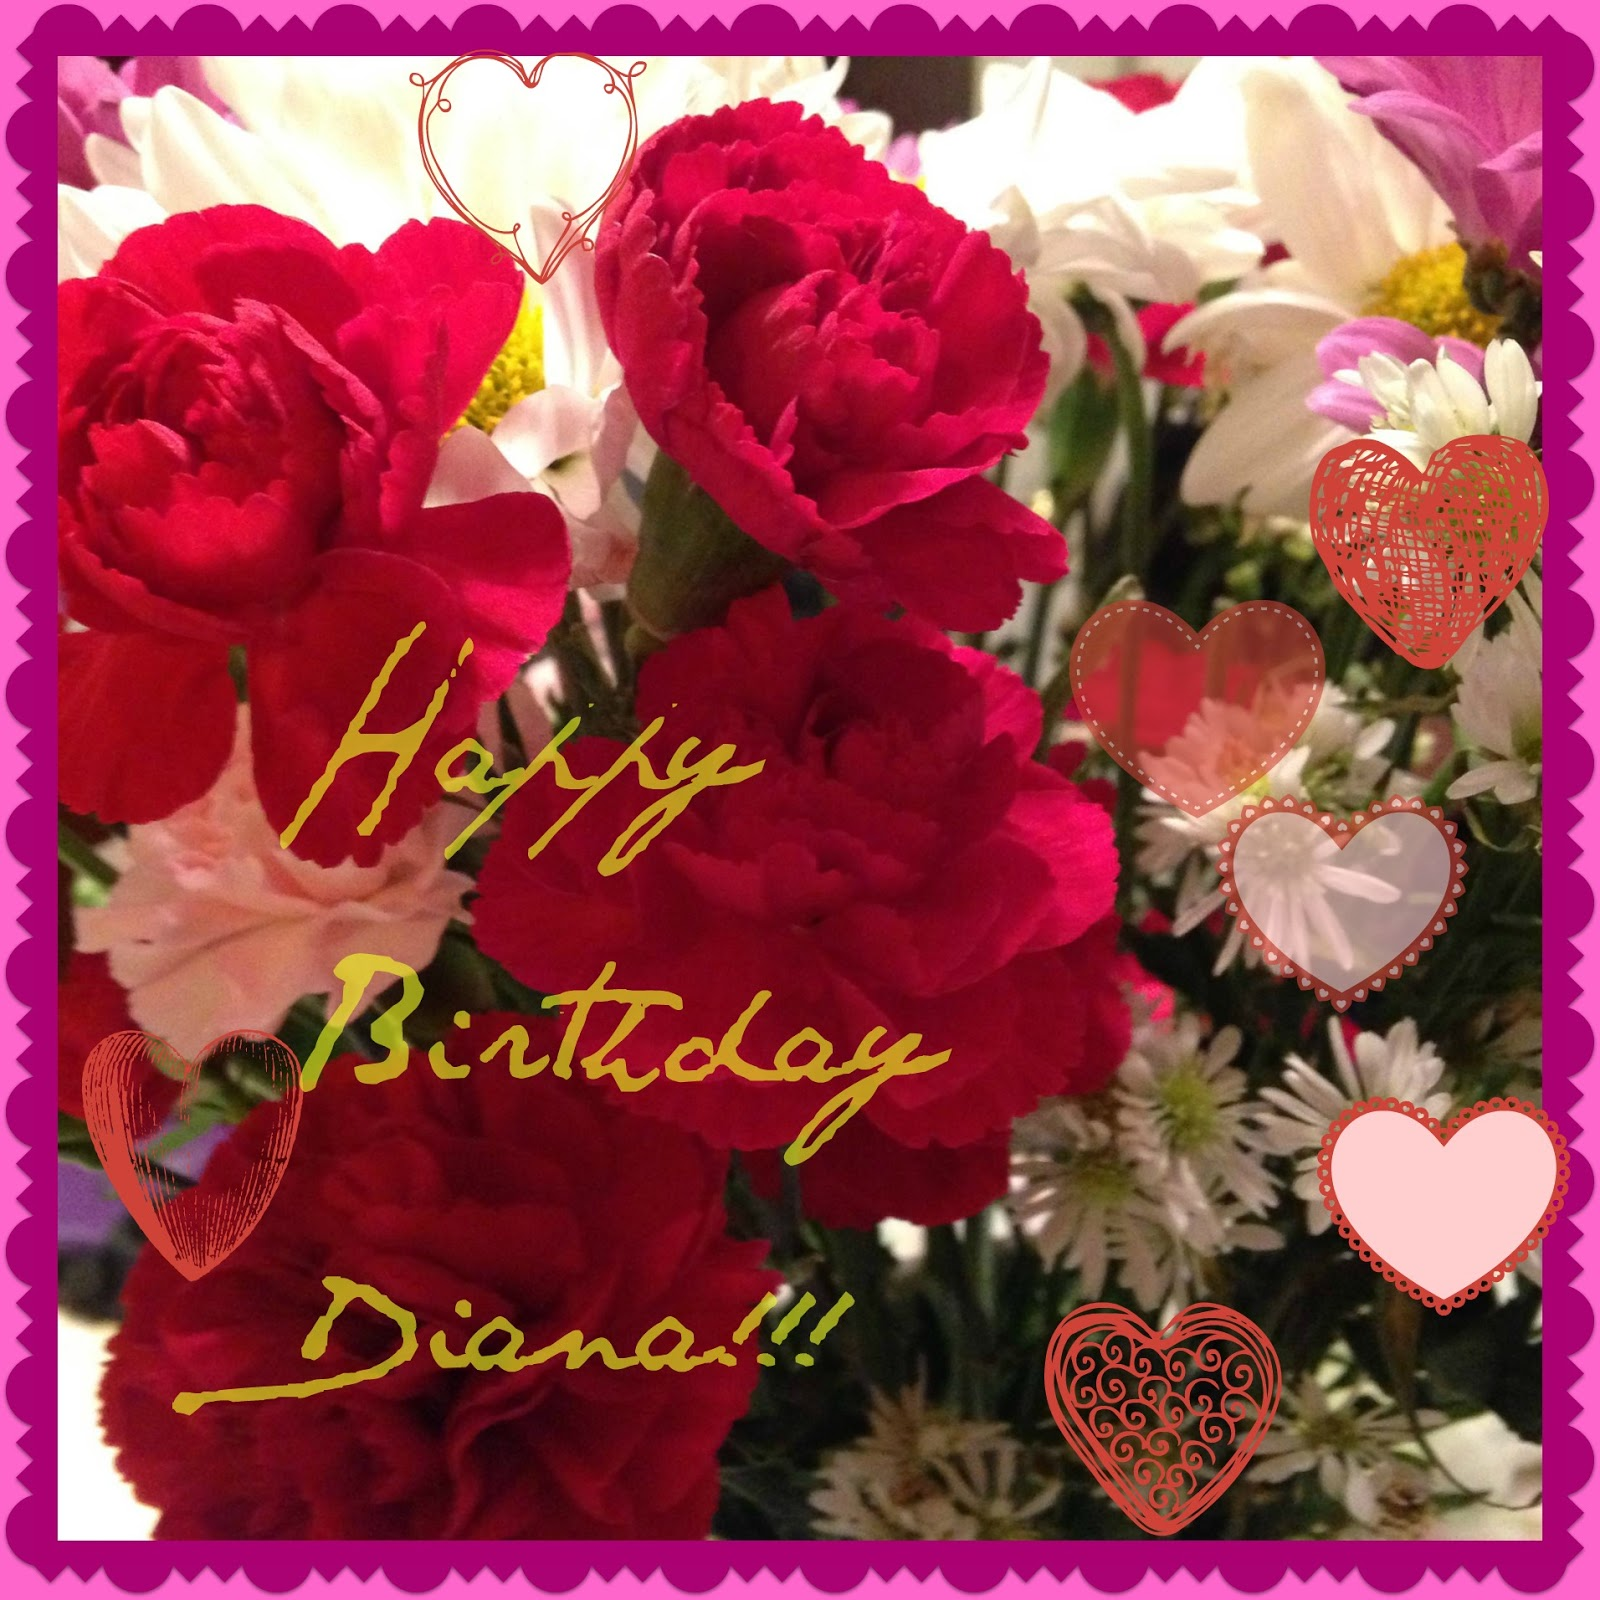 Overcoming with god happy birthday diana happy birthday diana izmirmasajfo Image collections